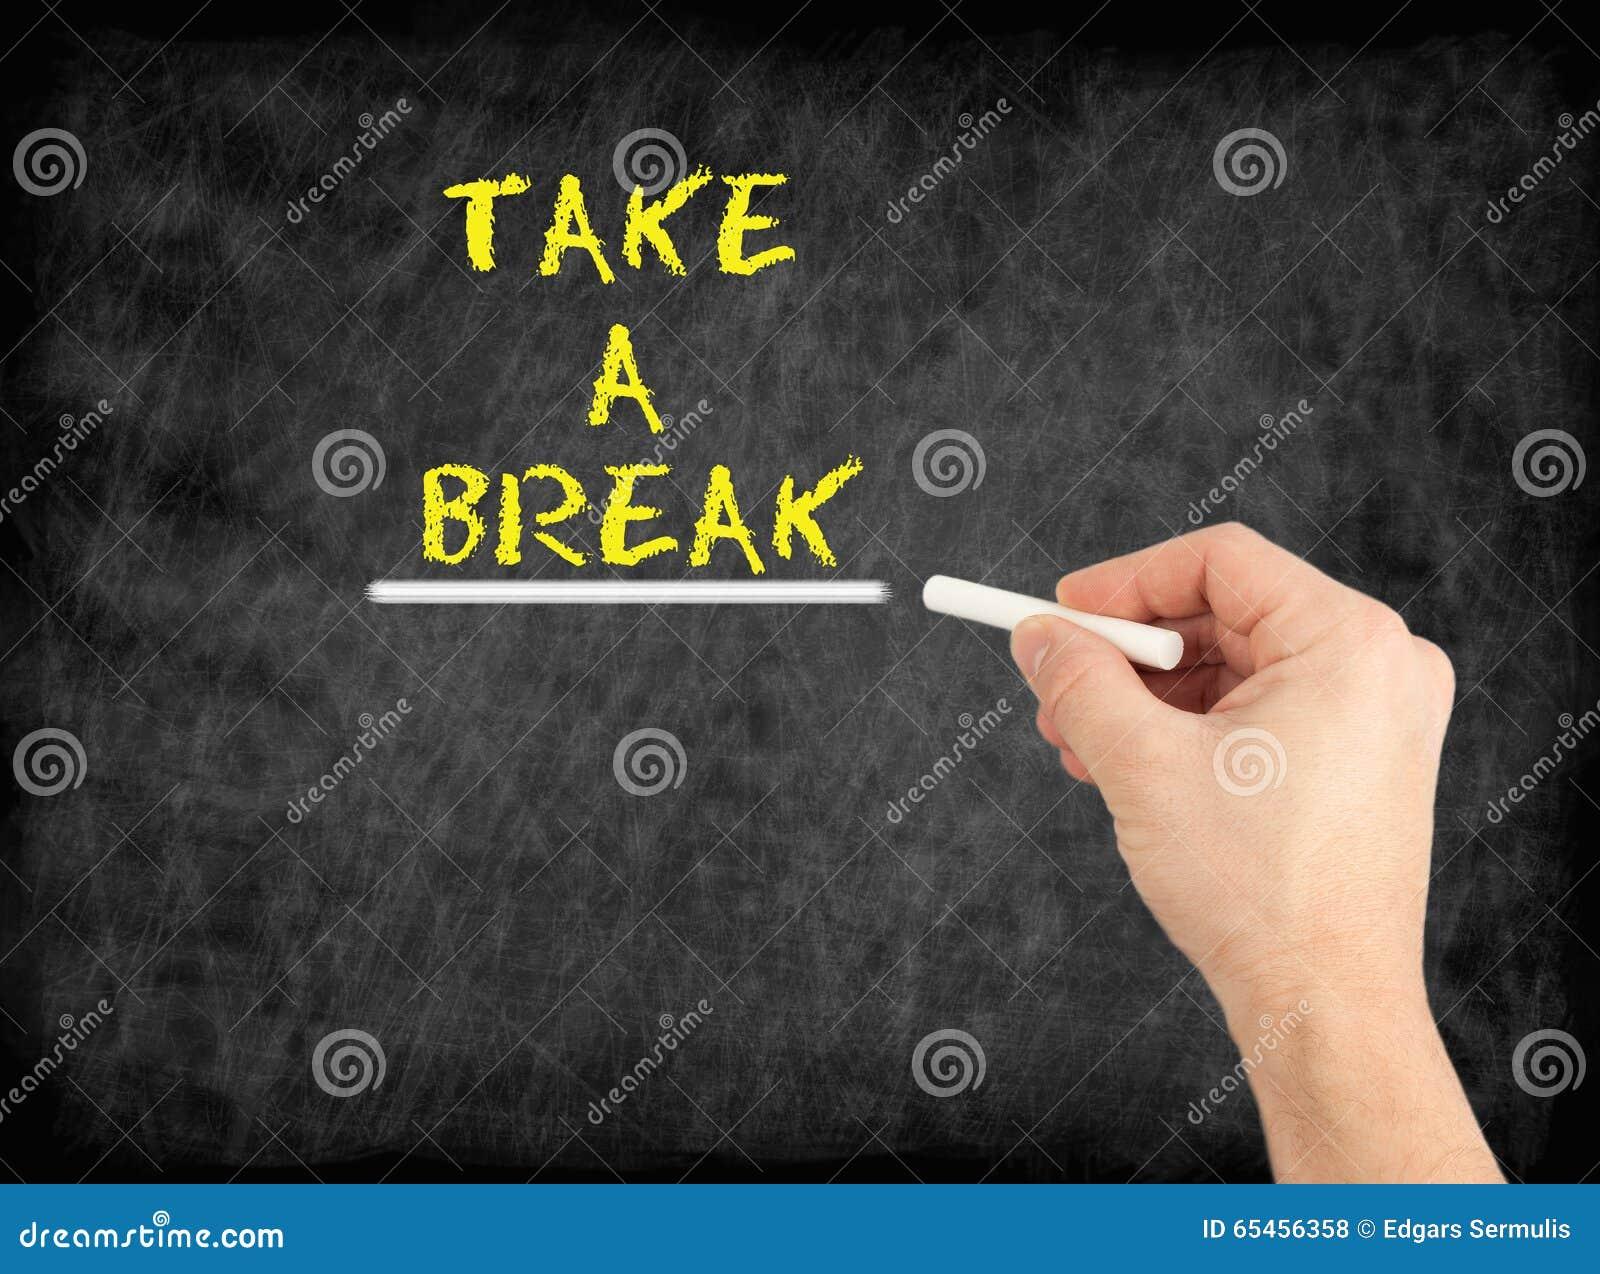 Take a Break - hand writing text on chalkboard